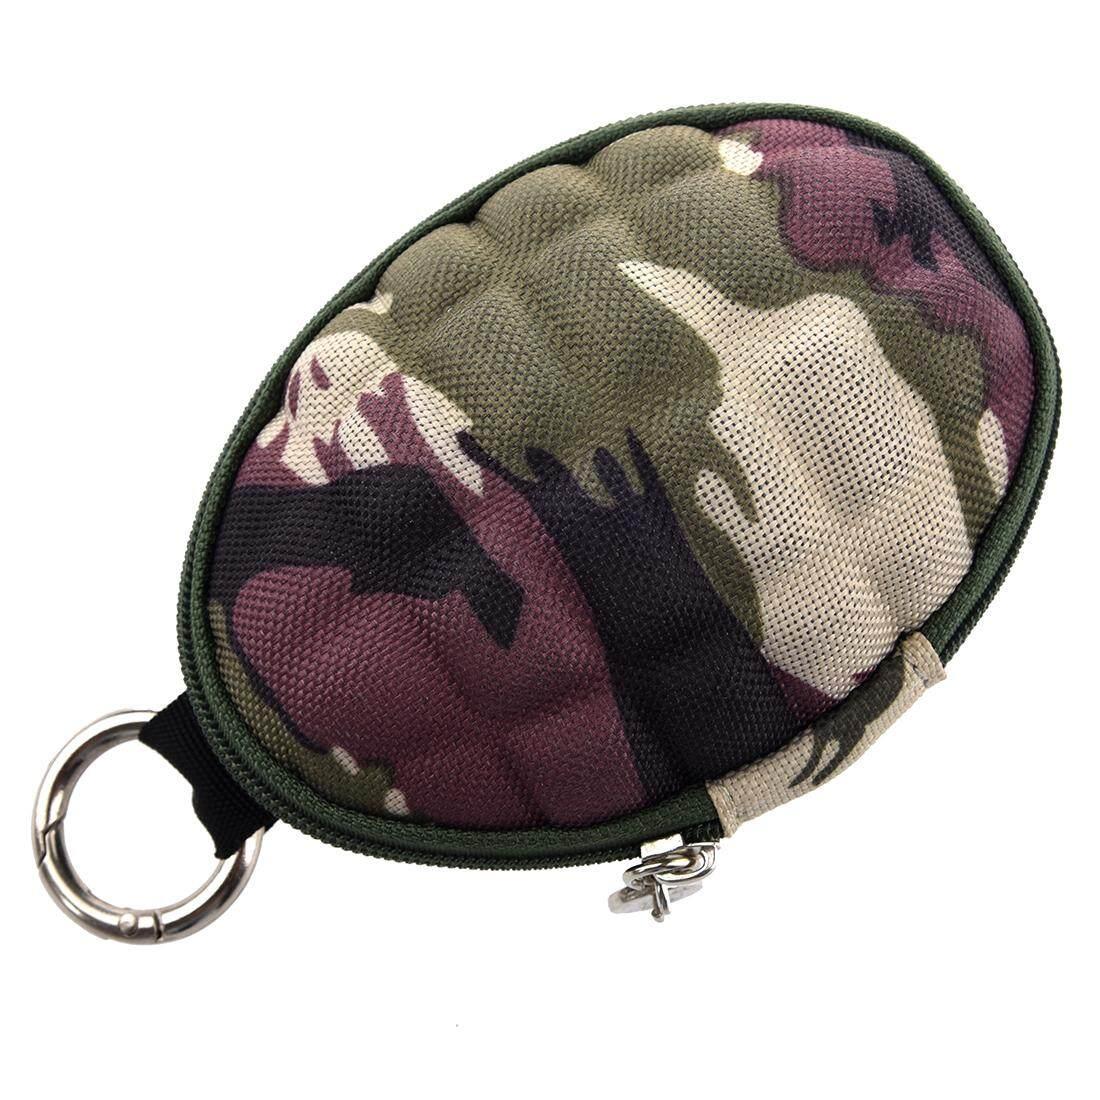 Camouflage Key & Coin Case Duck grenade / coin case / key case